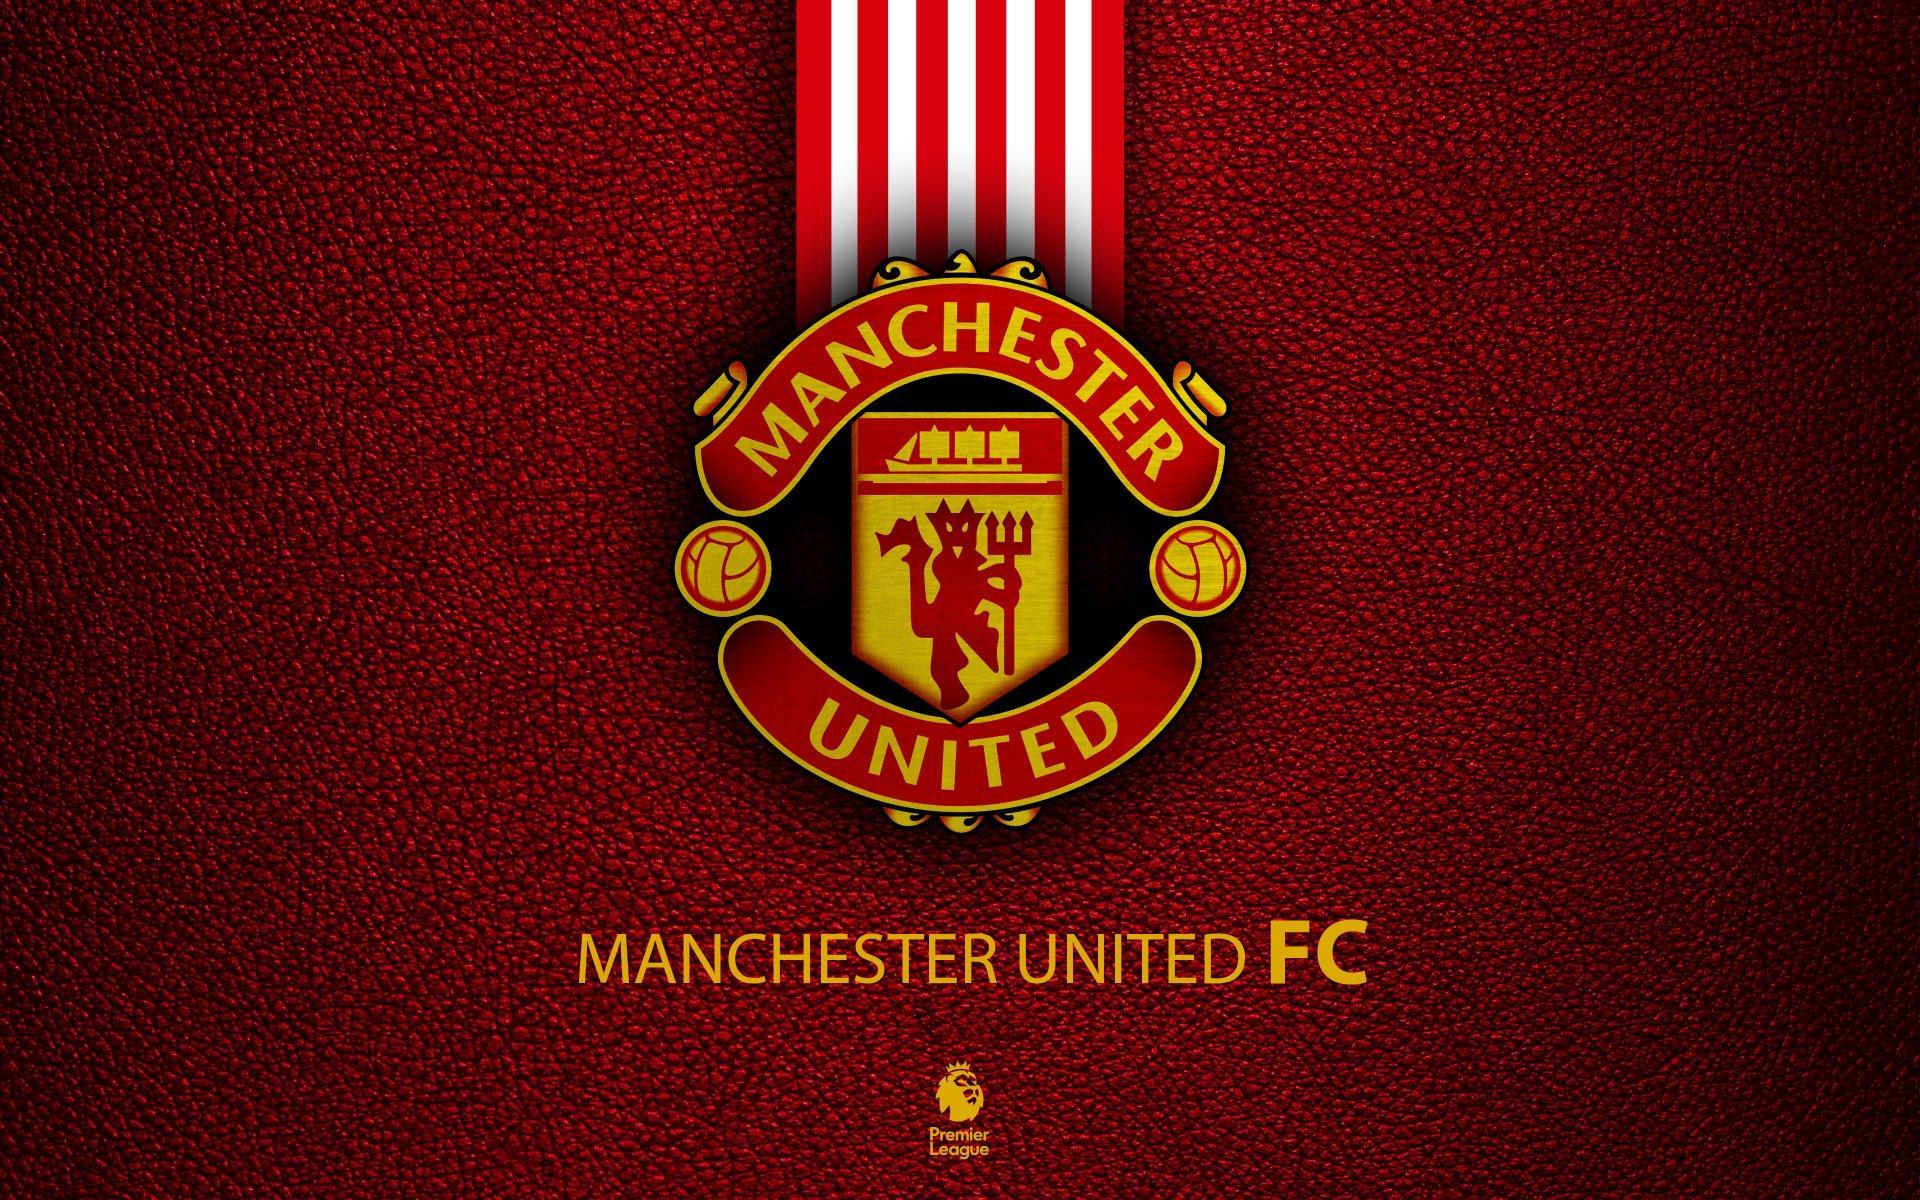 Man Utd Wallpapers Top Free Man Utd Backgrounds